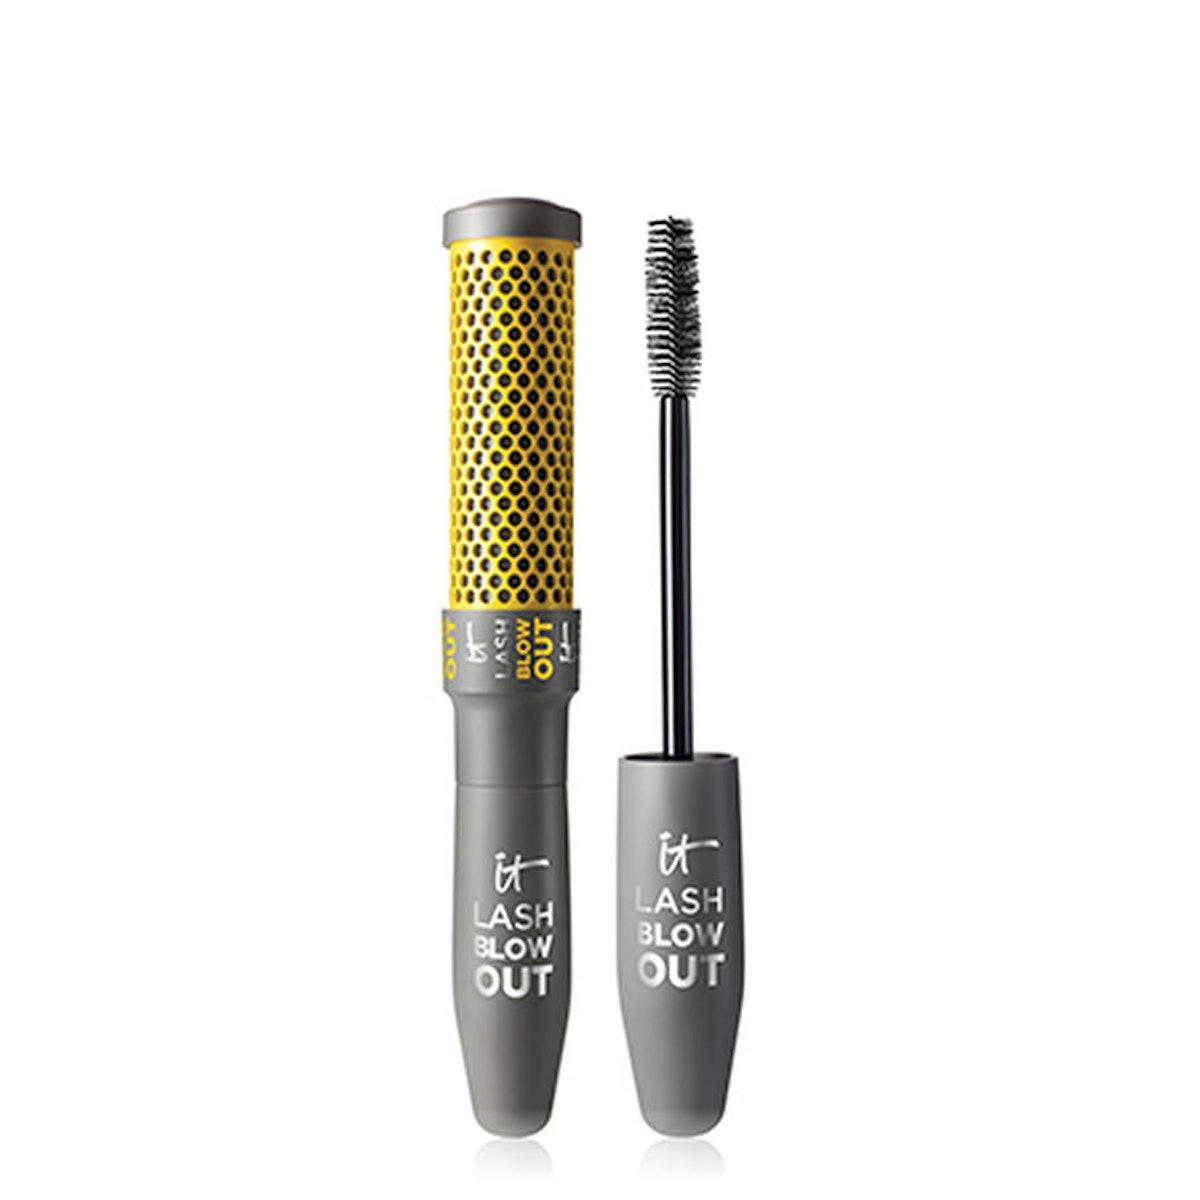 IT Cosmetics Lash Blowout Mascara